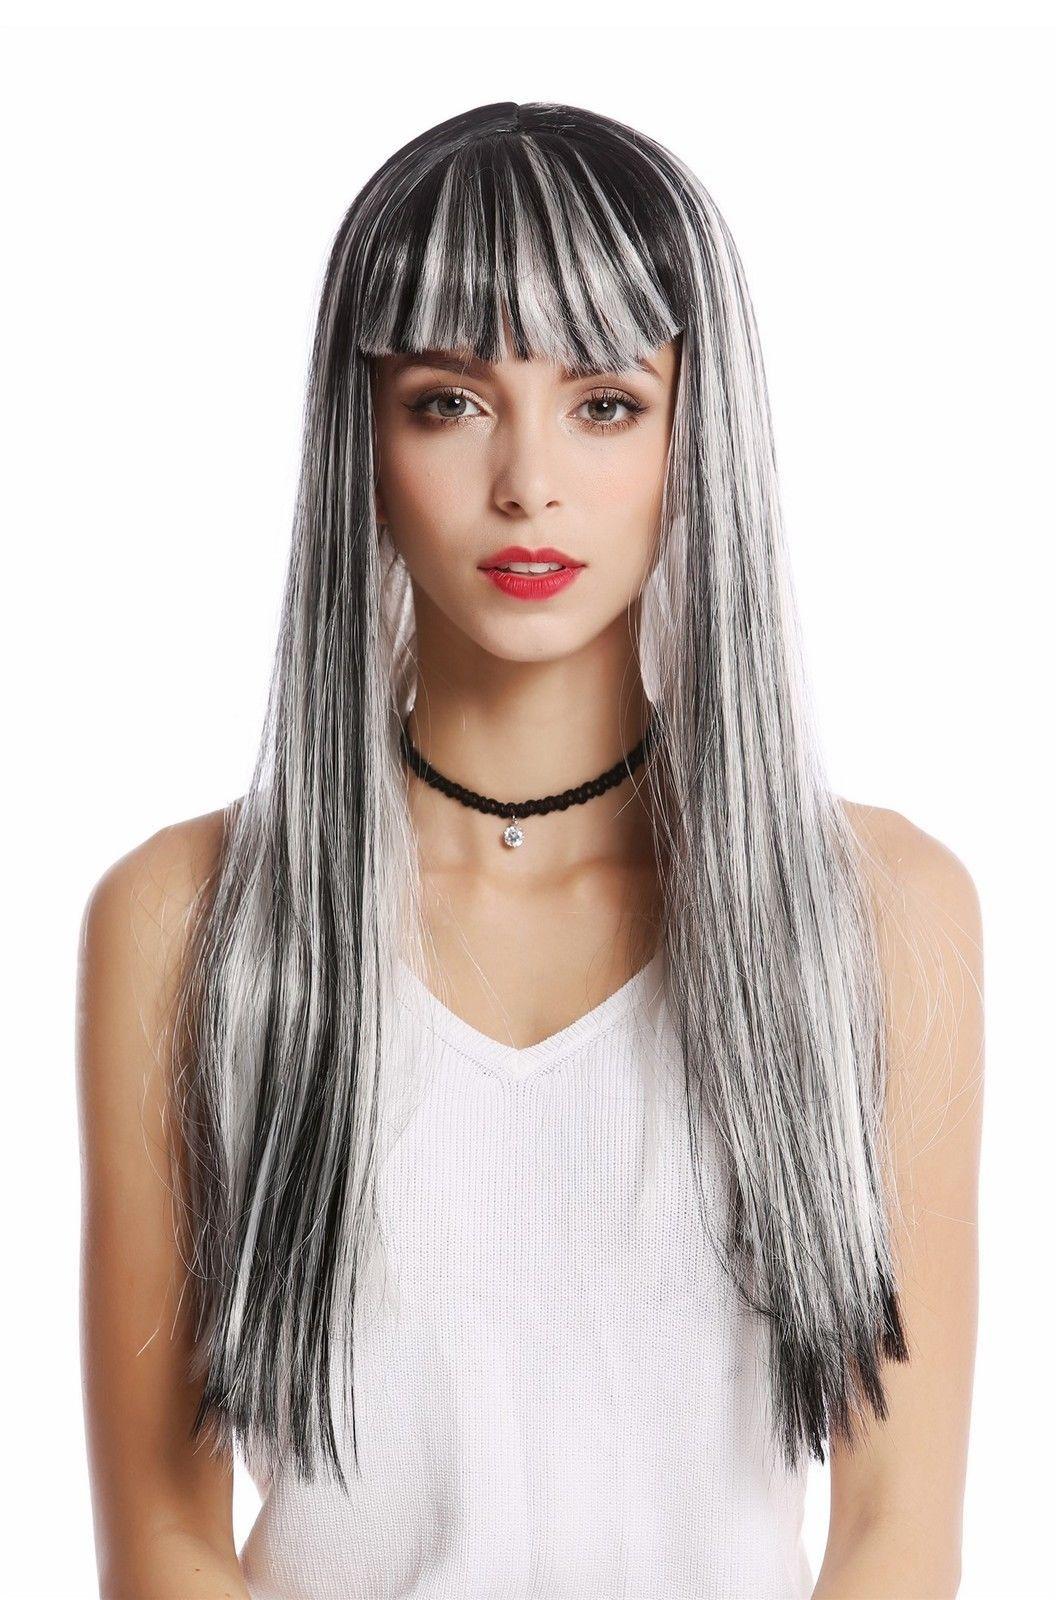 Perencke Damen Karneval Grau Schwarz Weiß gesträhnt gutt lang Pony Disko Alien